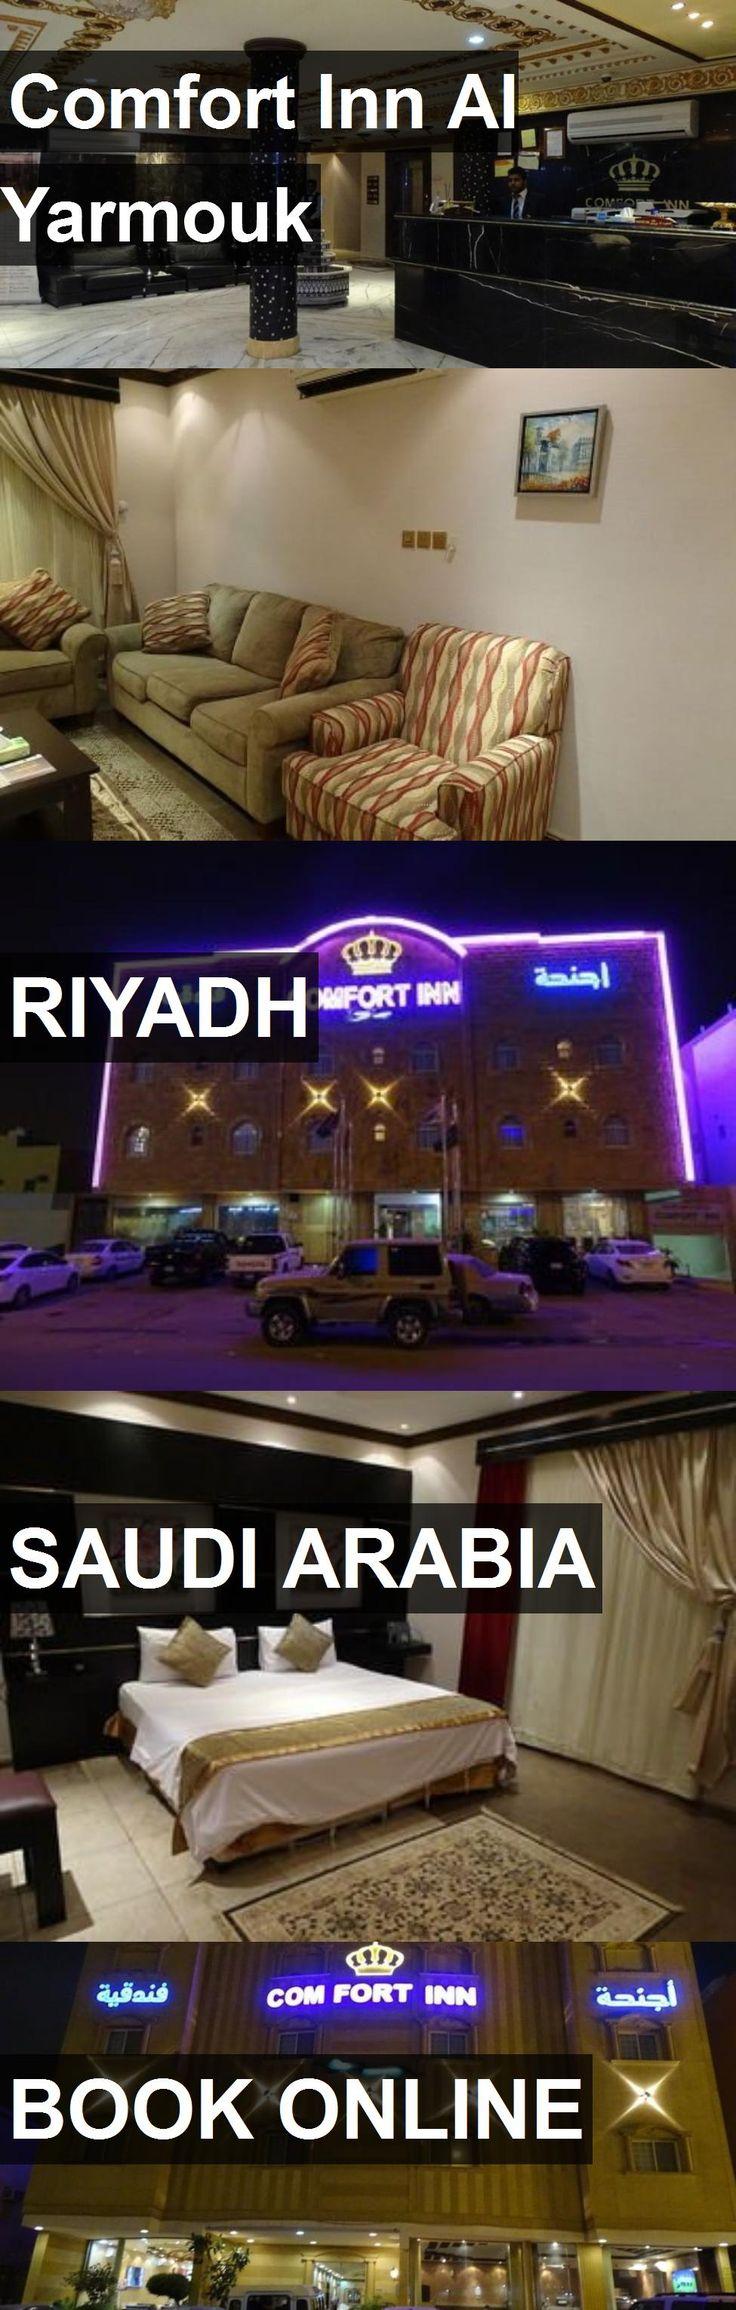 Hotel Comfort Inn Al Yarmouk in Riyadh, Saudi Arabia. For more information, photos, reviews and best prices please follow the link. #SaudiArabia #Riyadh #travel #vacation #hotel